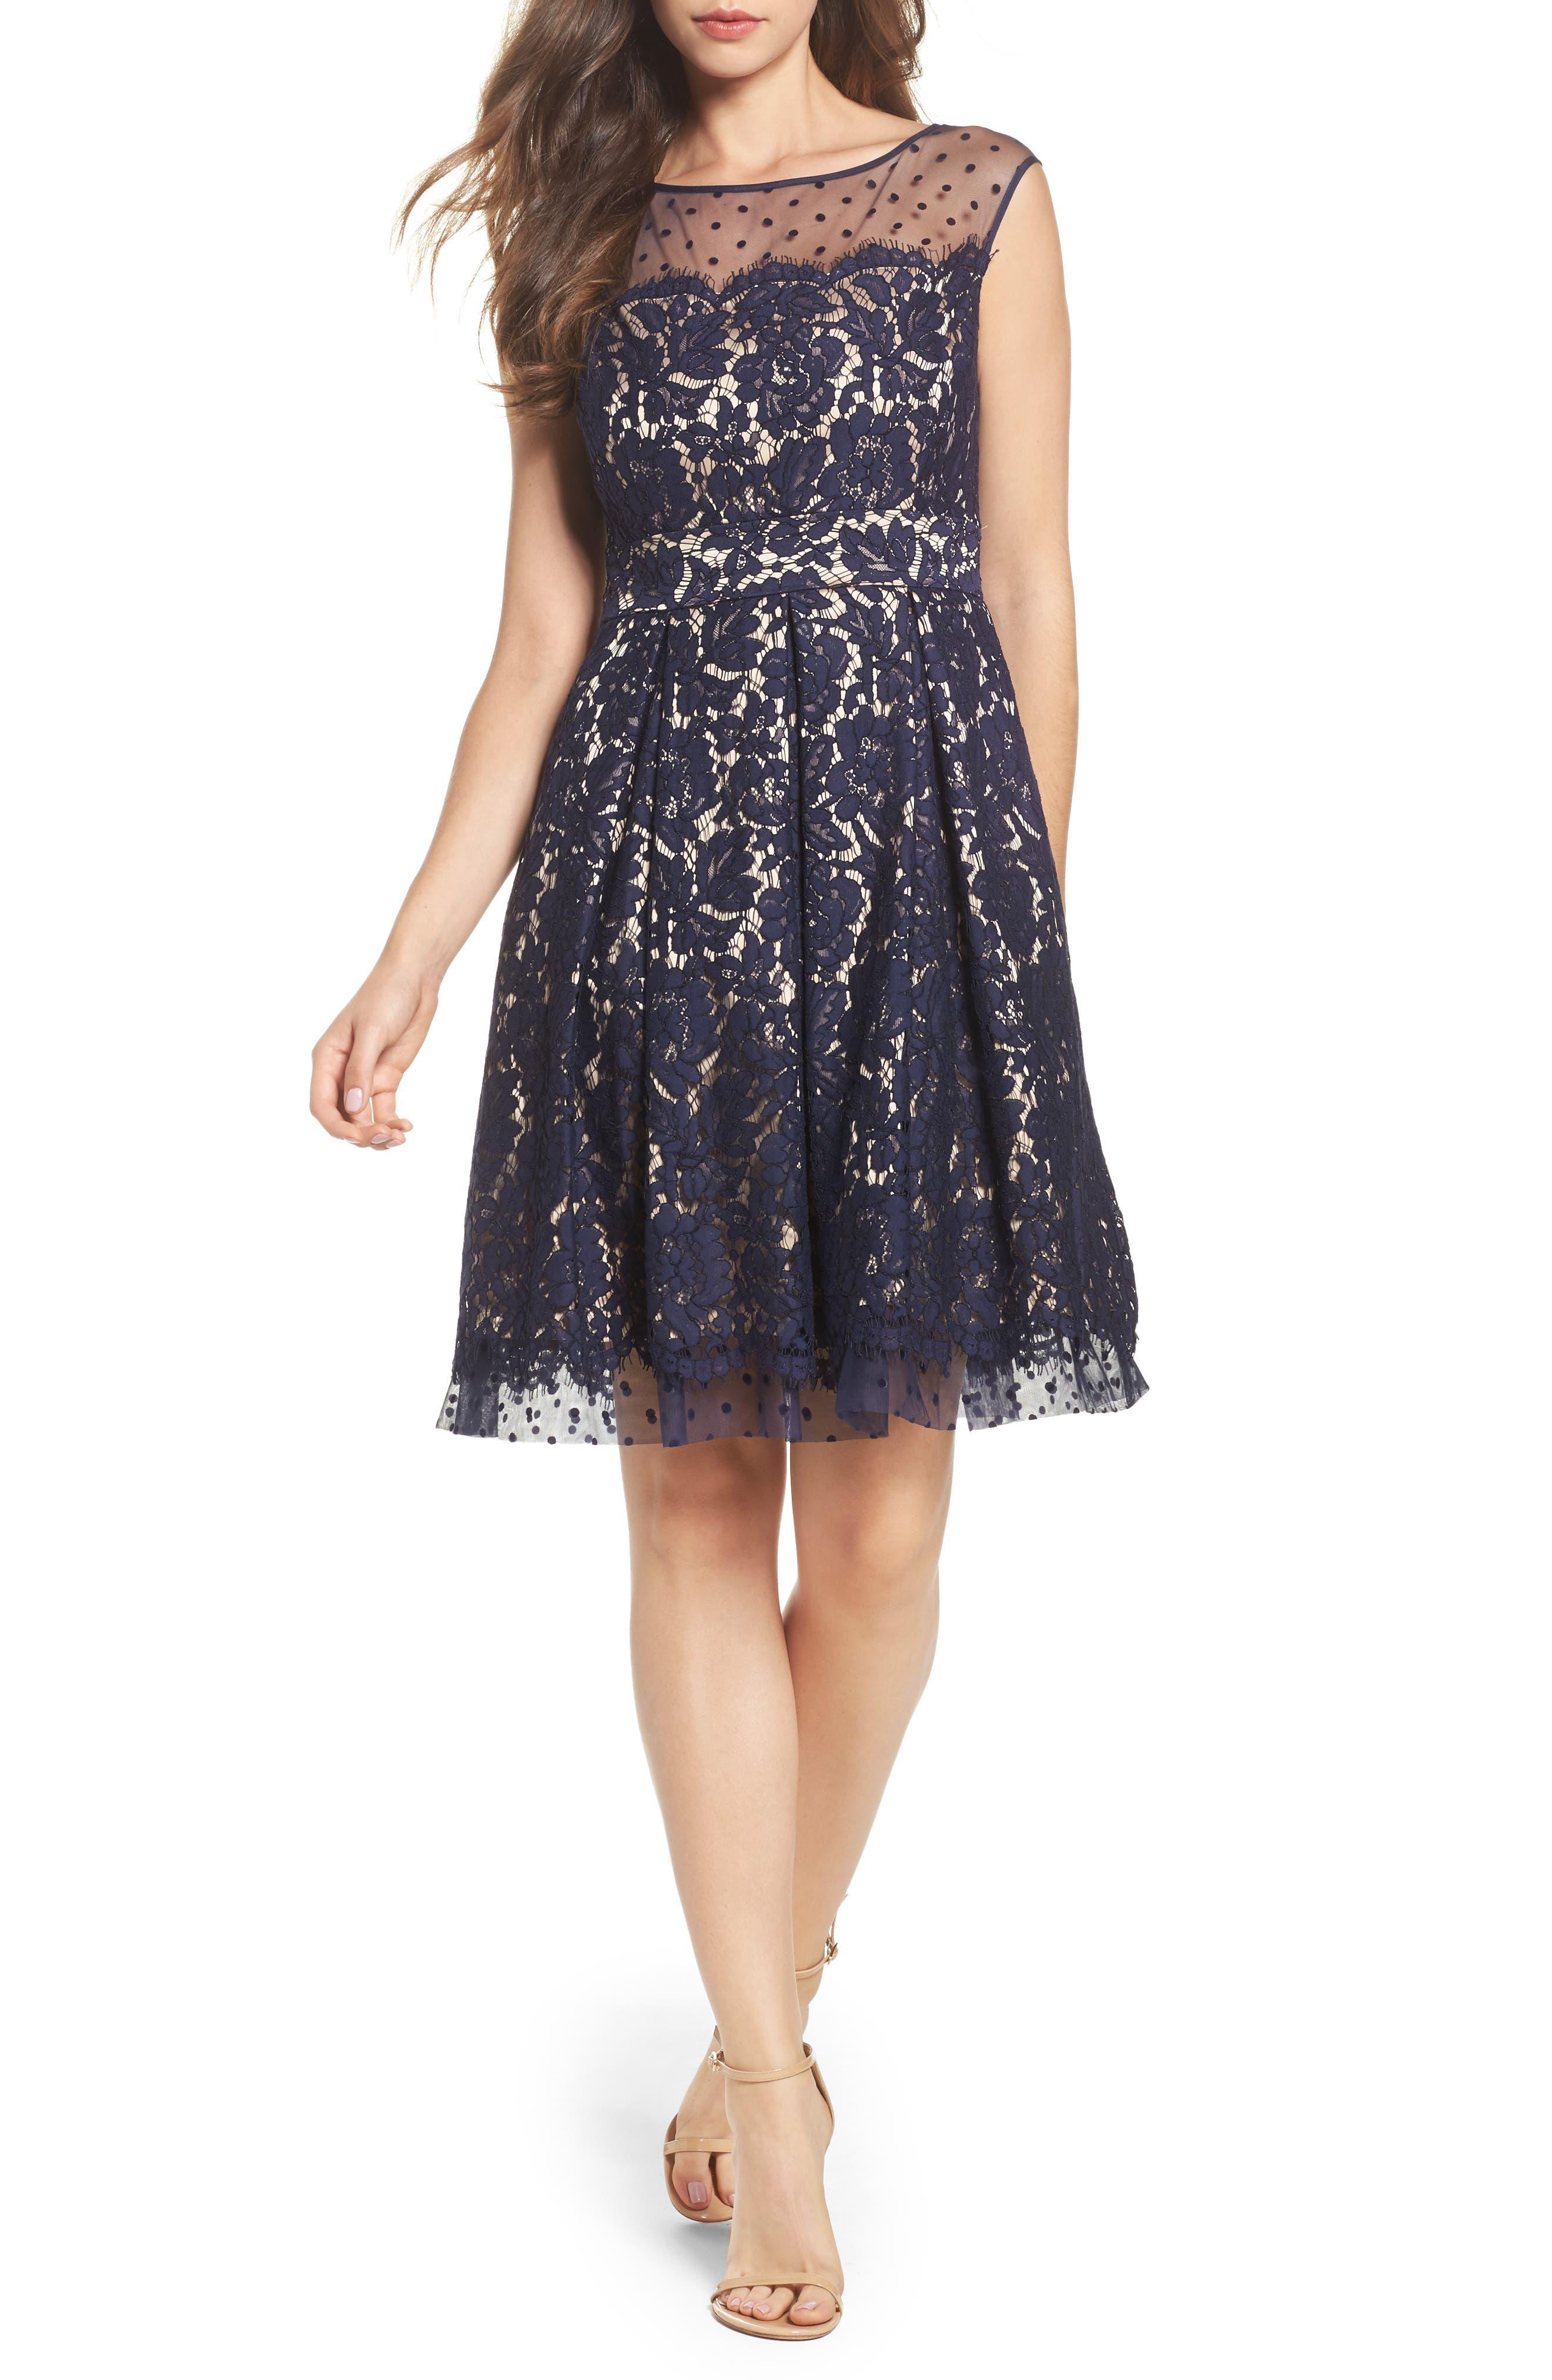 Alternate Image 1 Selected - Eliza J Illusion Yoke Lace Fit & Flare Dress